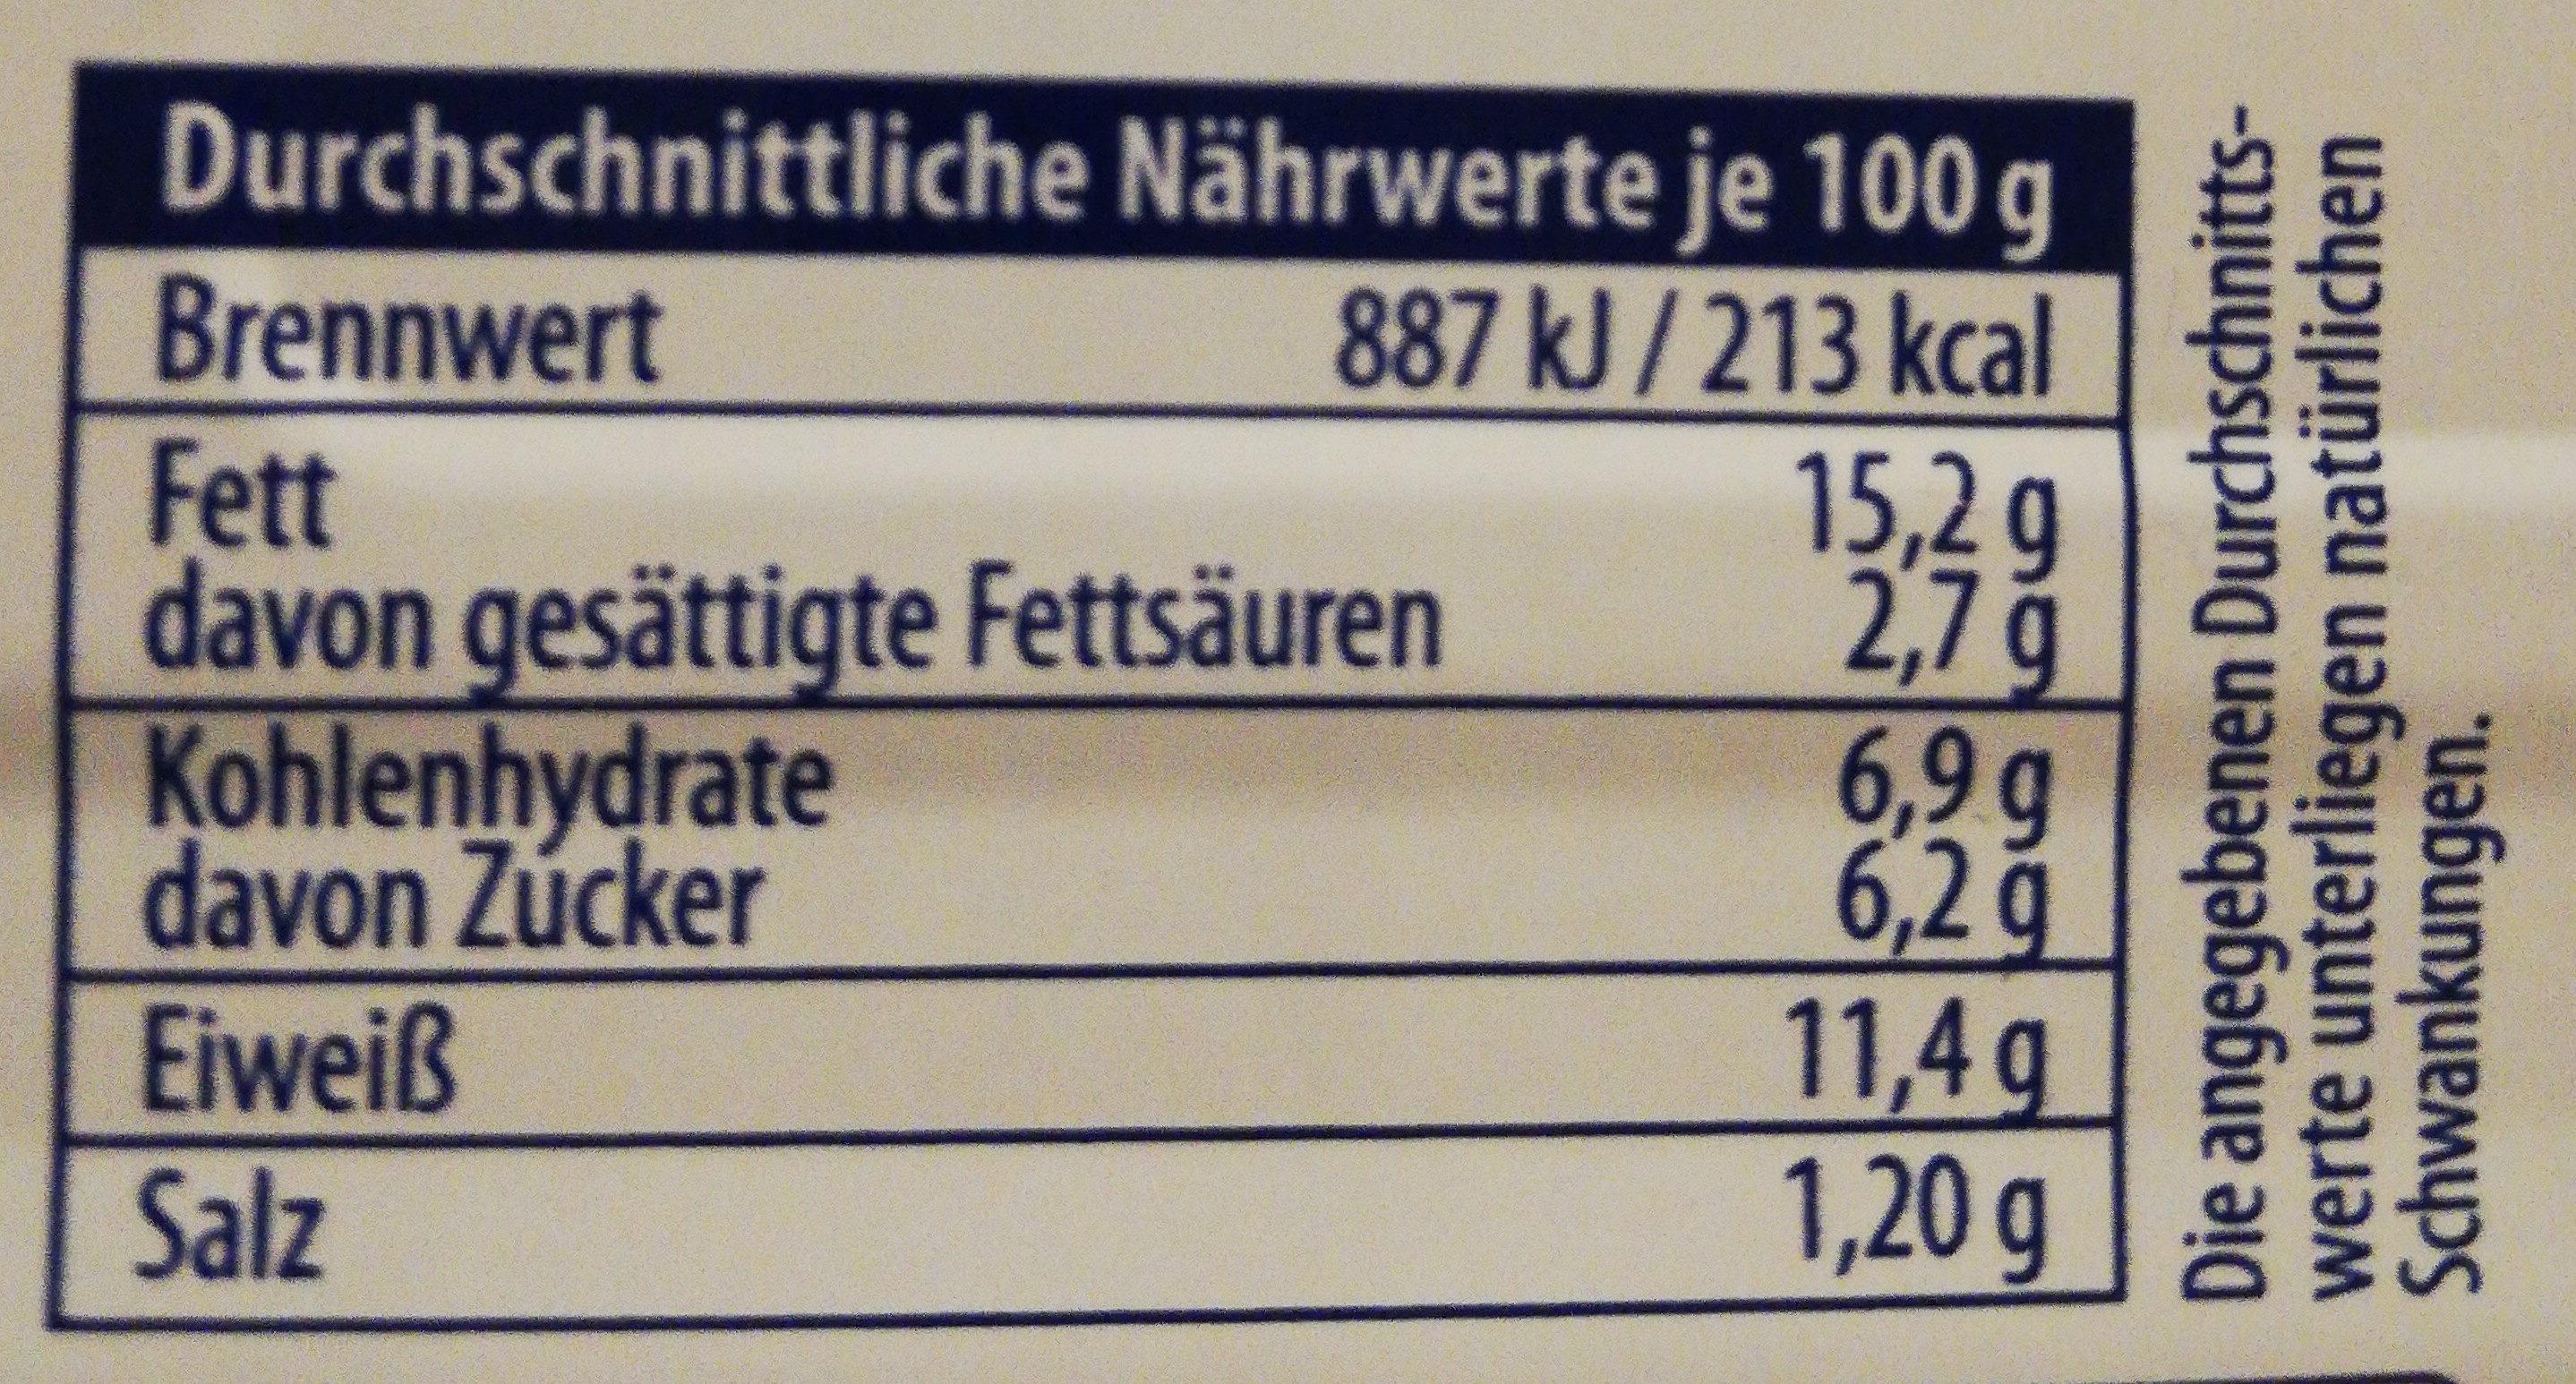 Fischbüchse Hering Filets in Piri-Mango-Creme - Valori nutrizionali - de